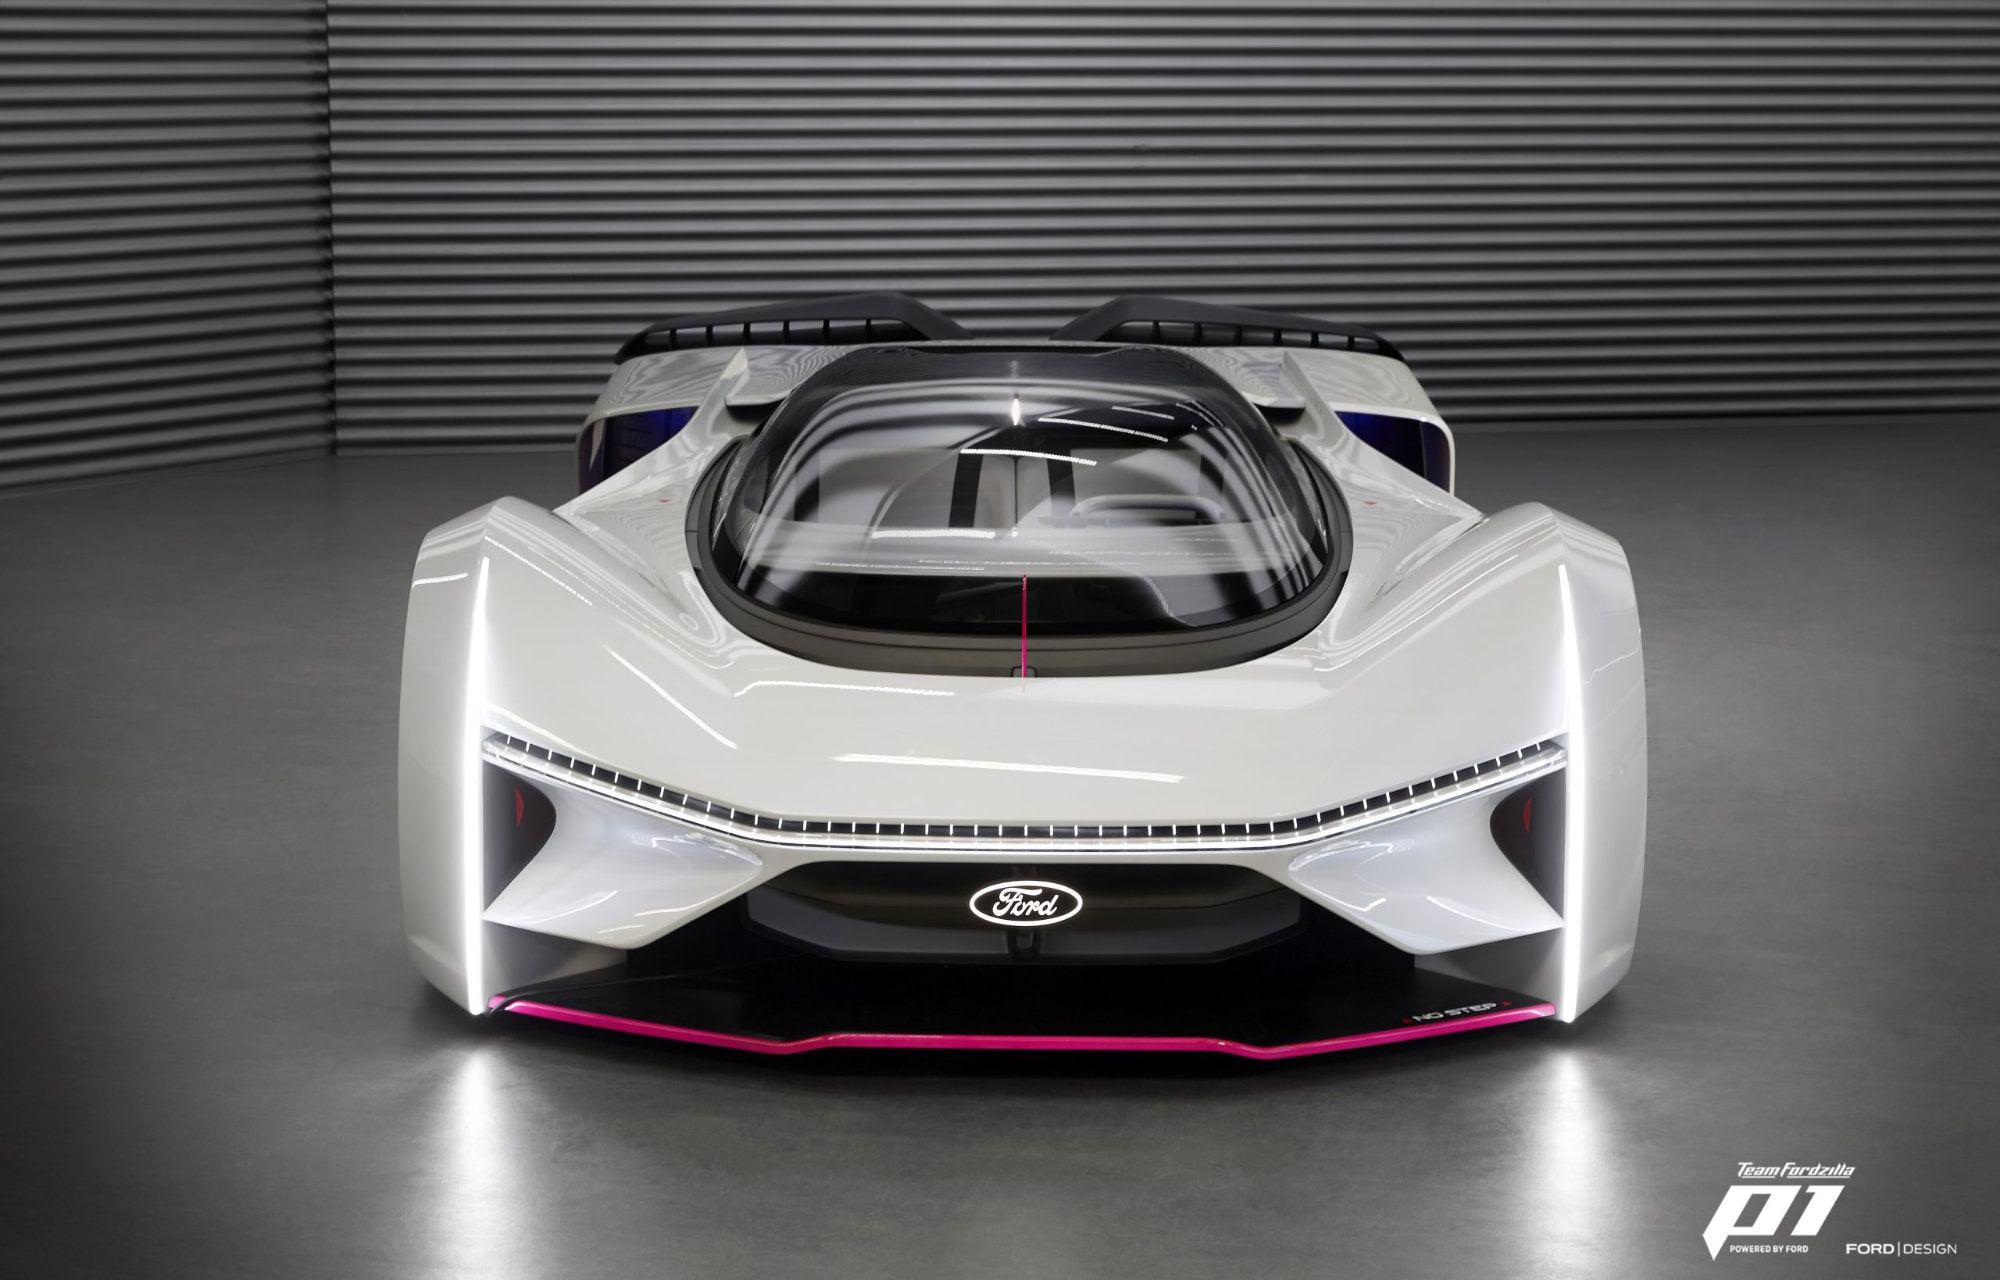 P1 Raceauto